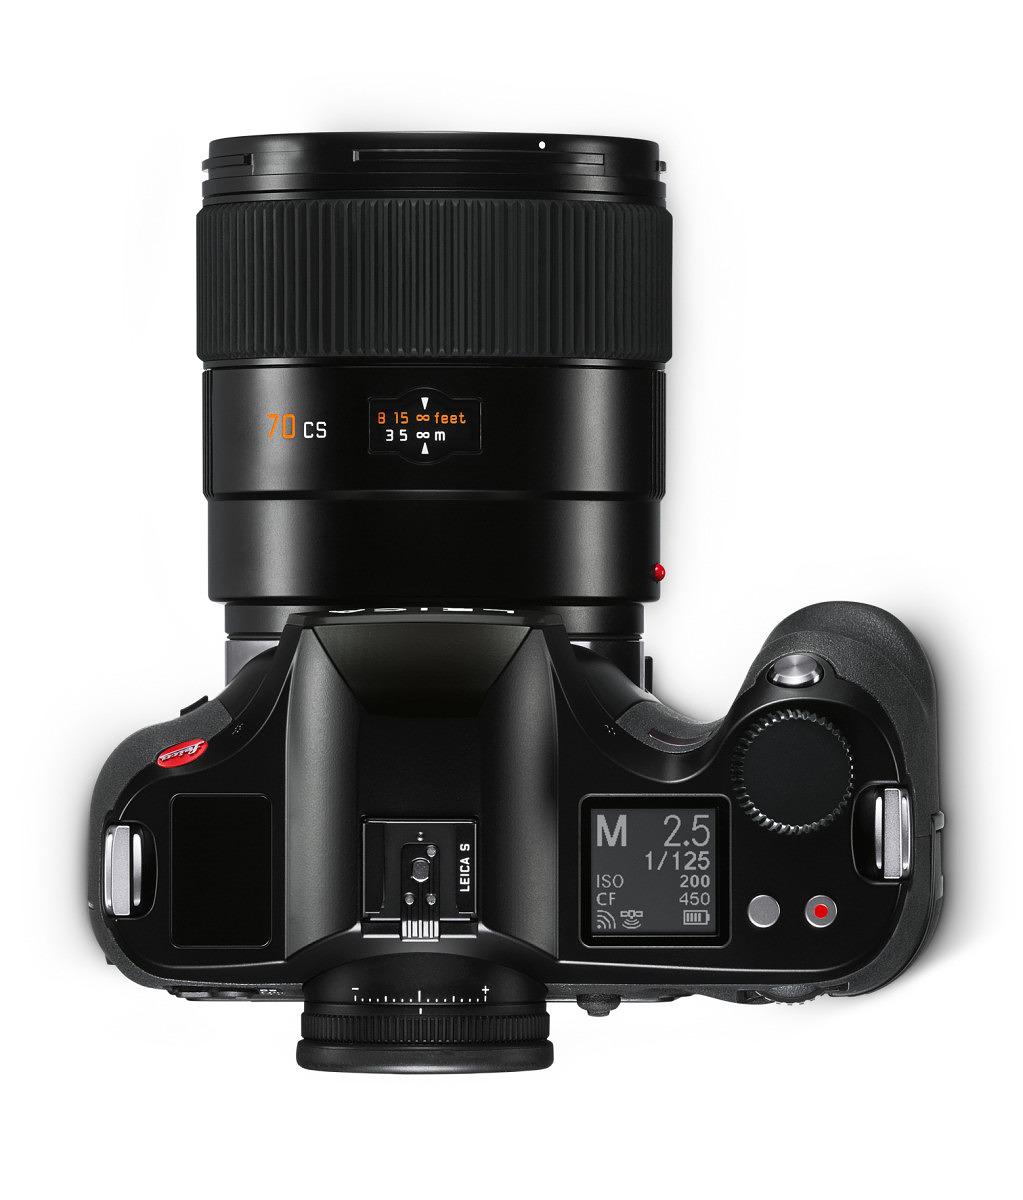 Leica S_Typ 007_top